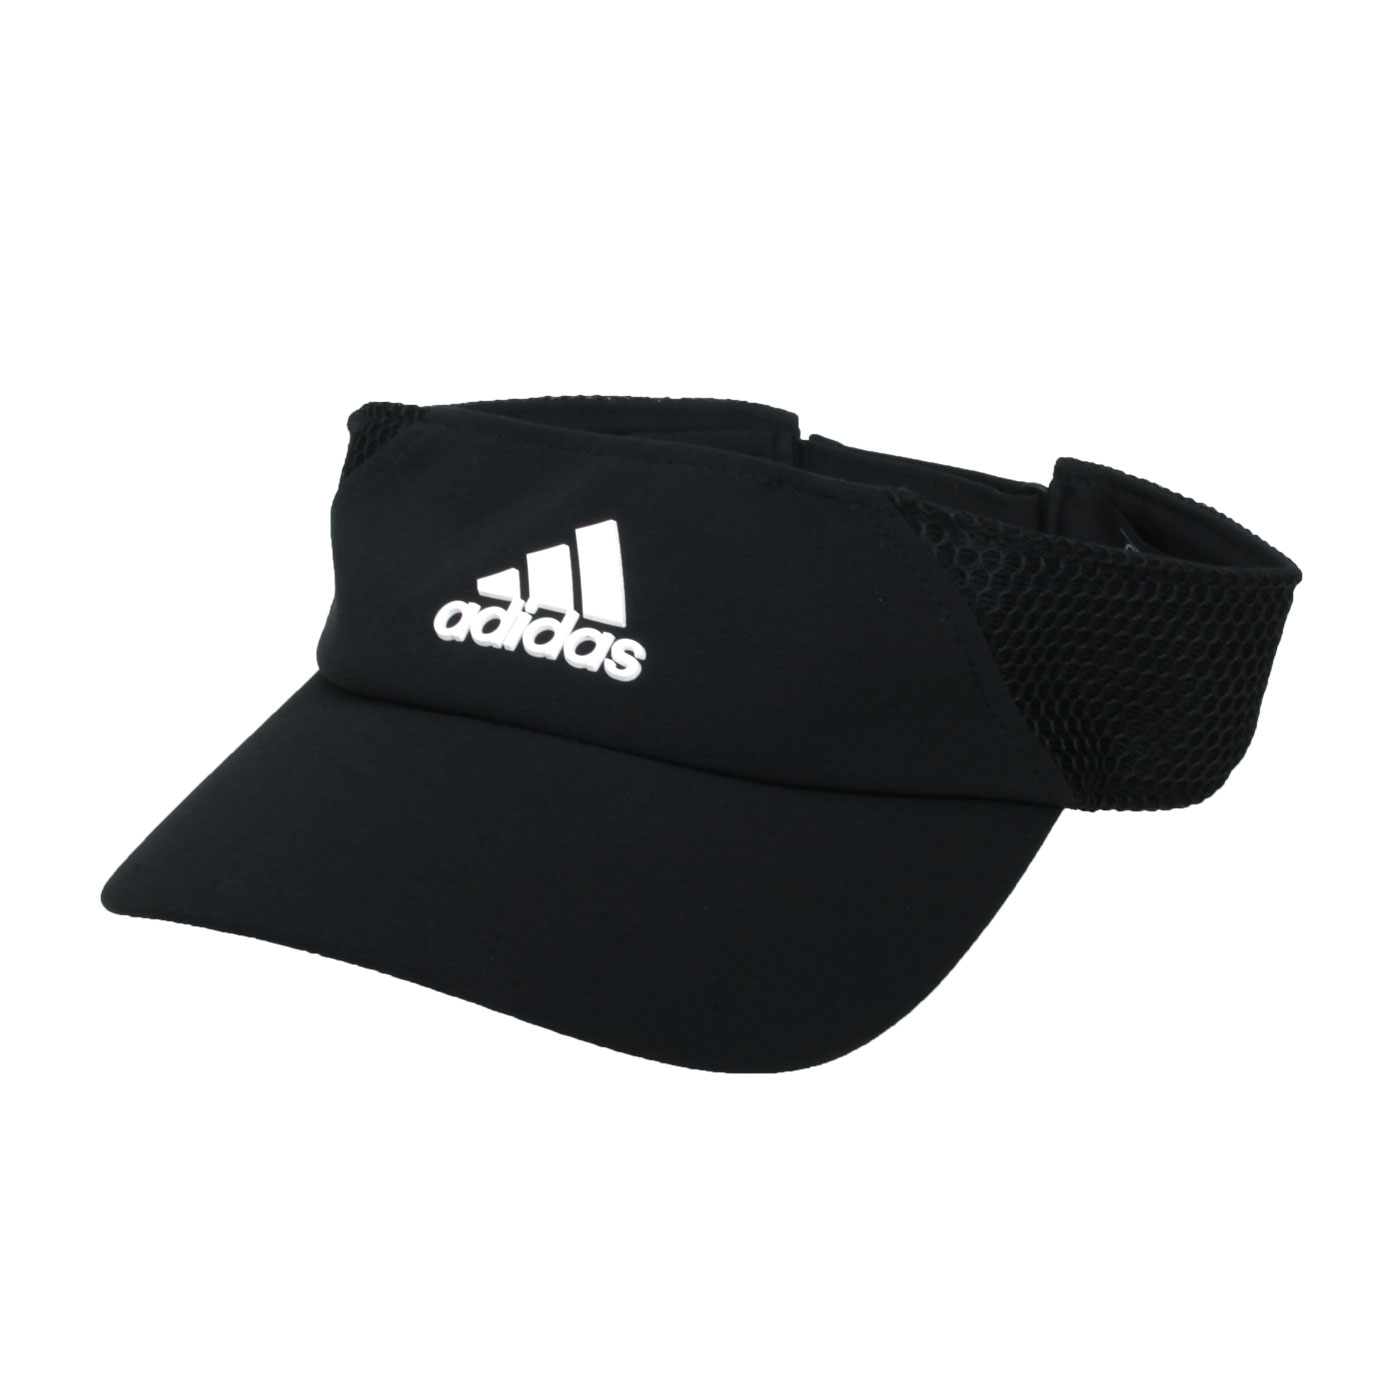 ADIDAS 帽子 GM6299